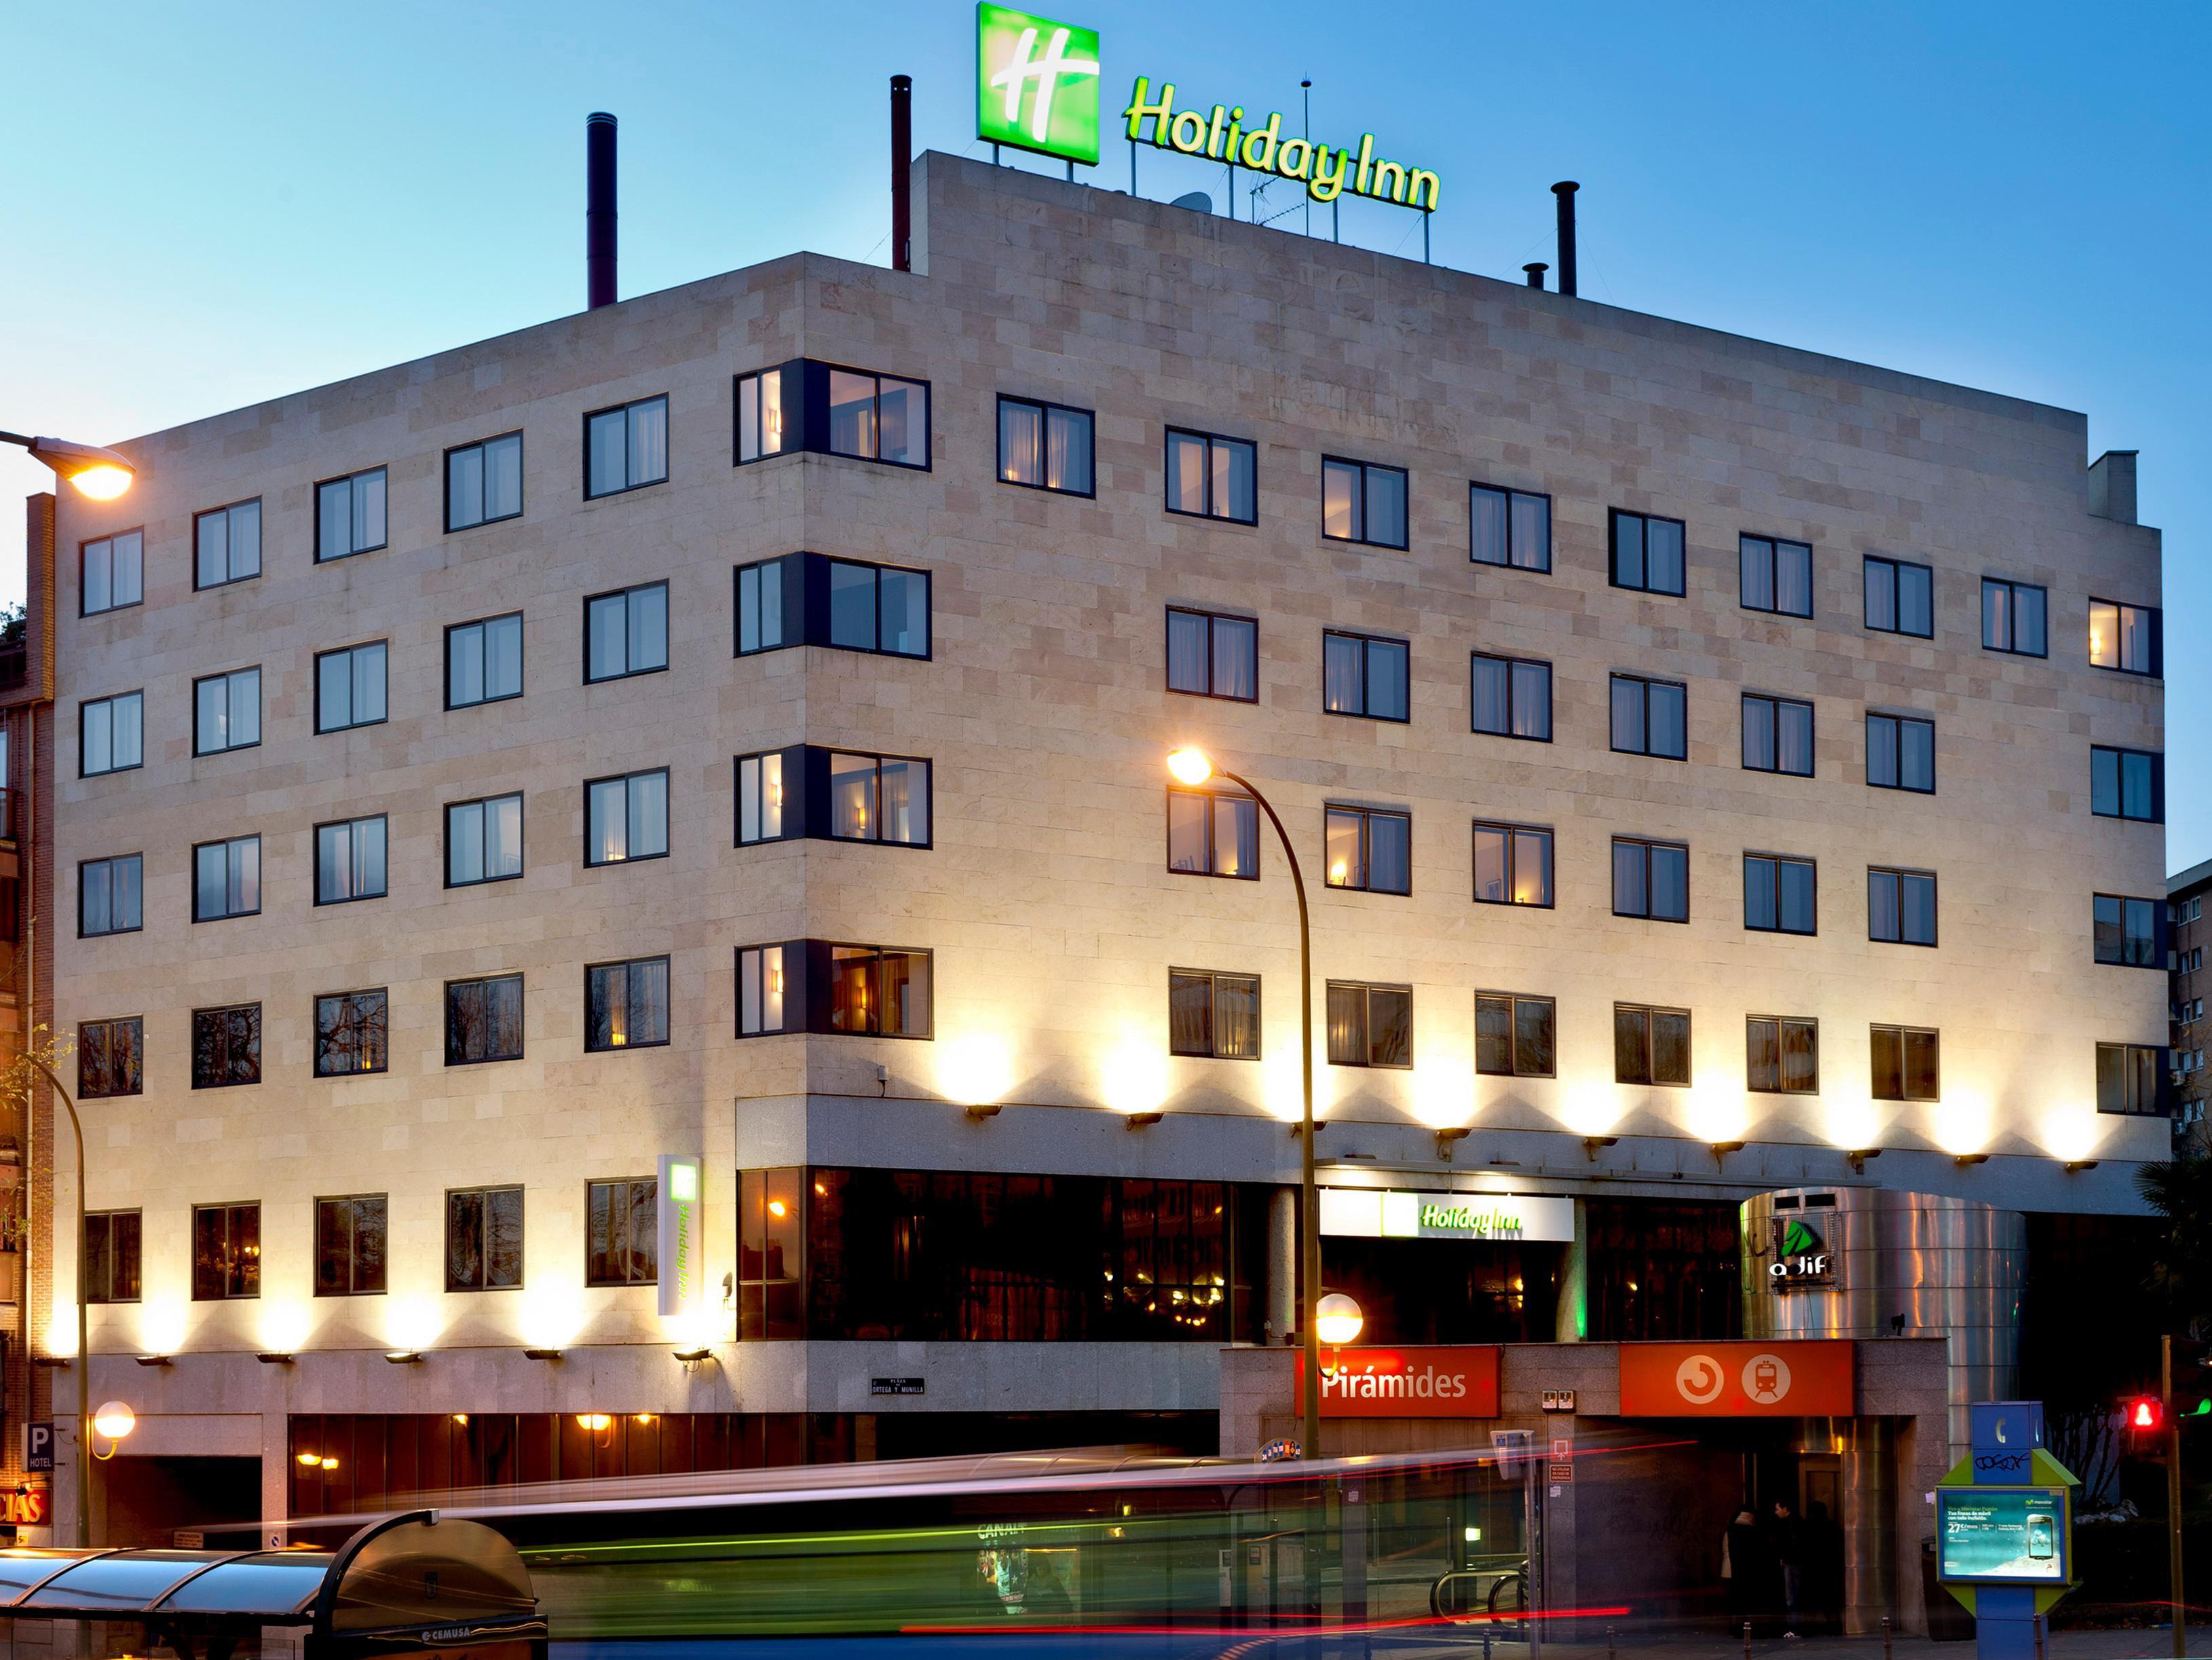 Hoteles en madrid centro holiday inn madrid piramides for Blau hotels oficinas centrales